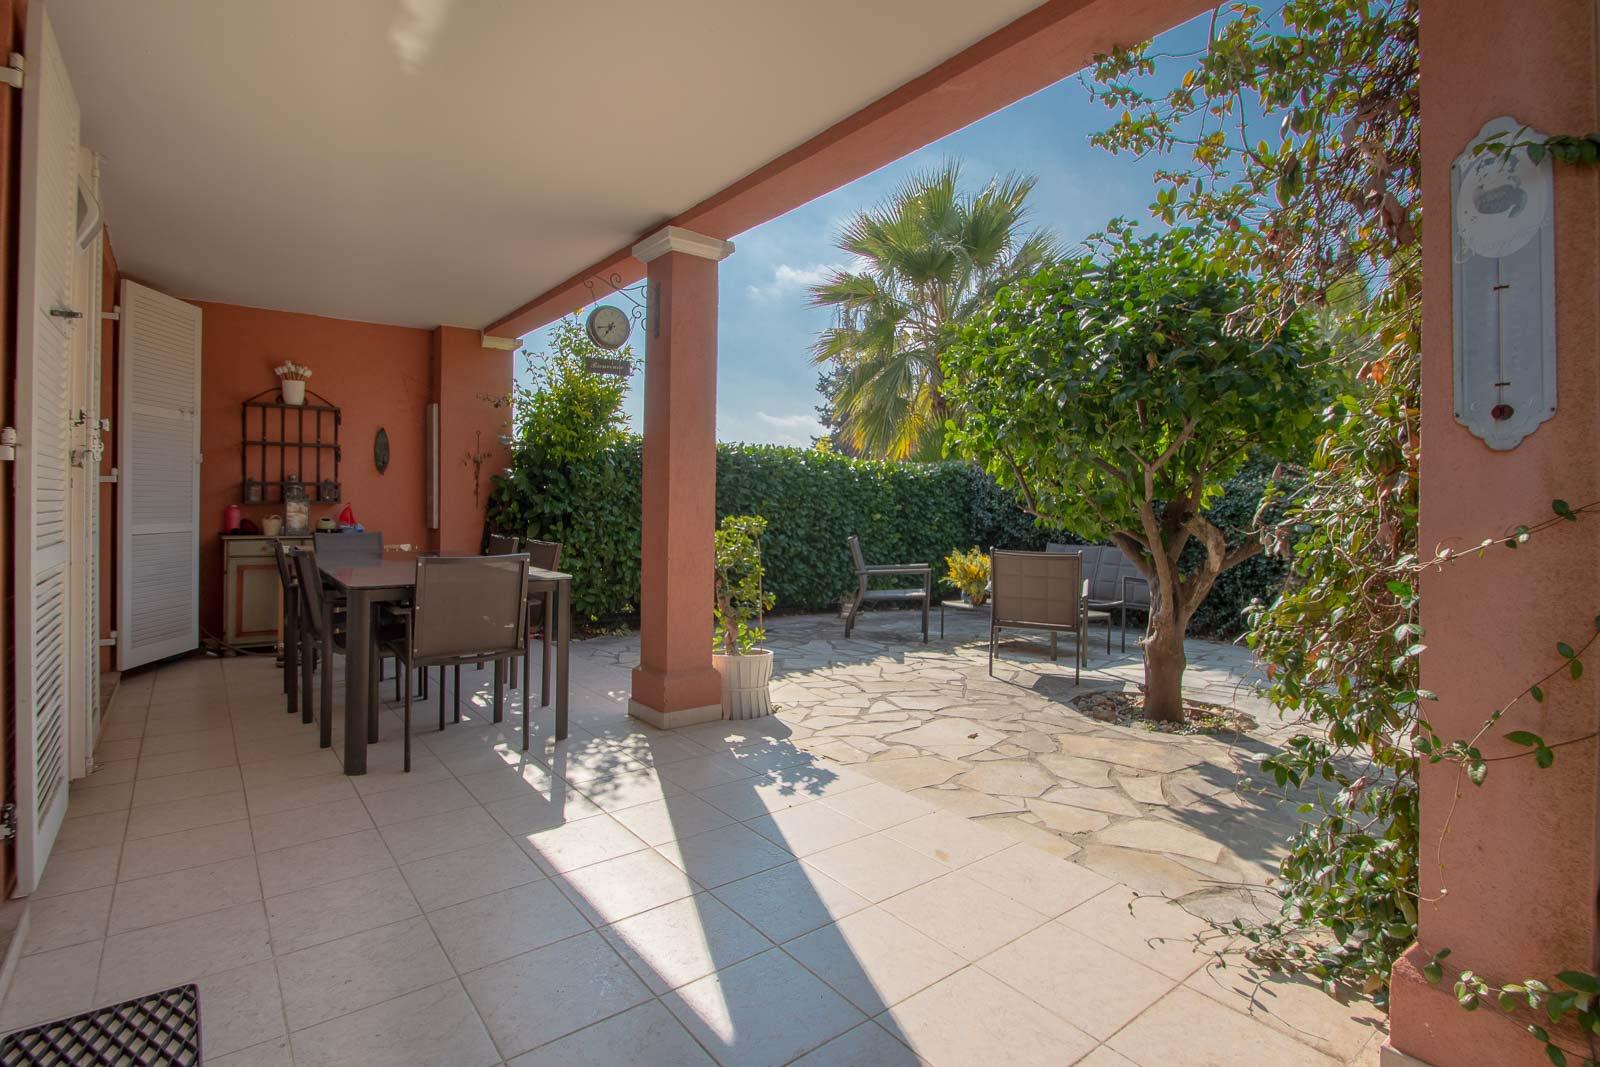 Maison 4 P vue jardin et piscine aperçu mer, terrasse